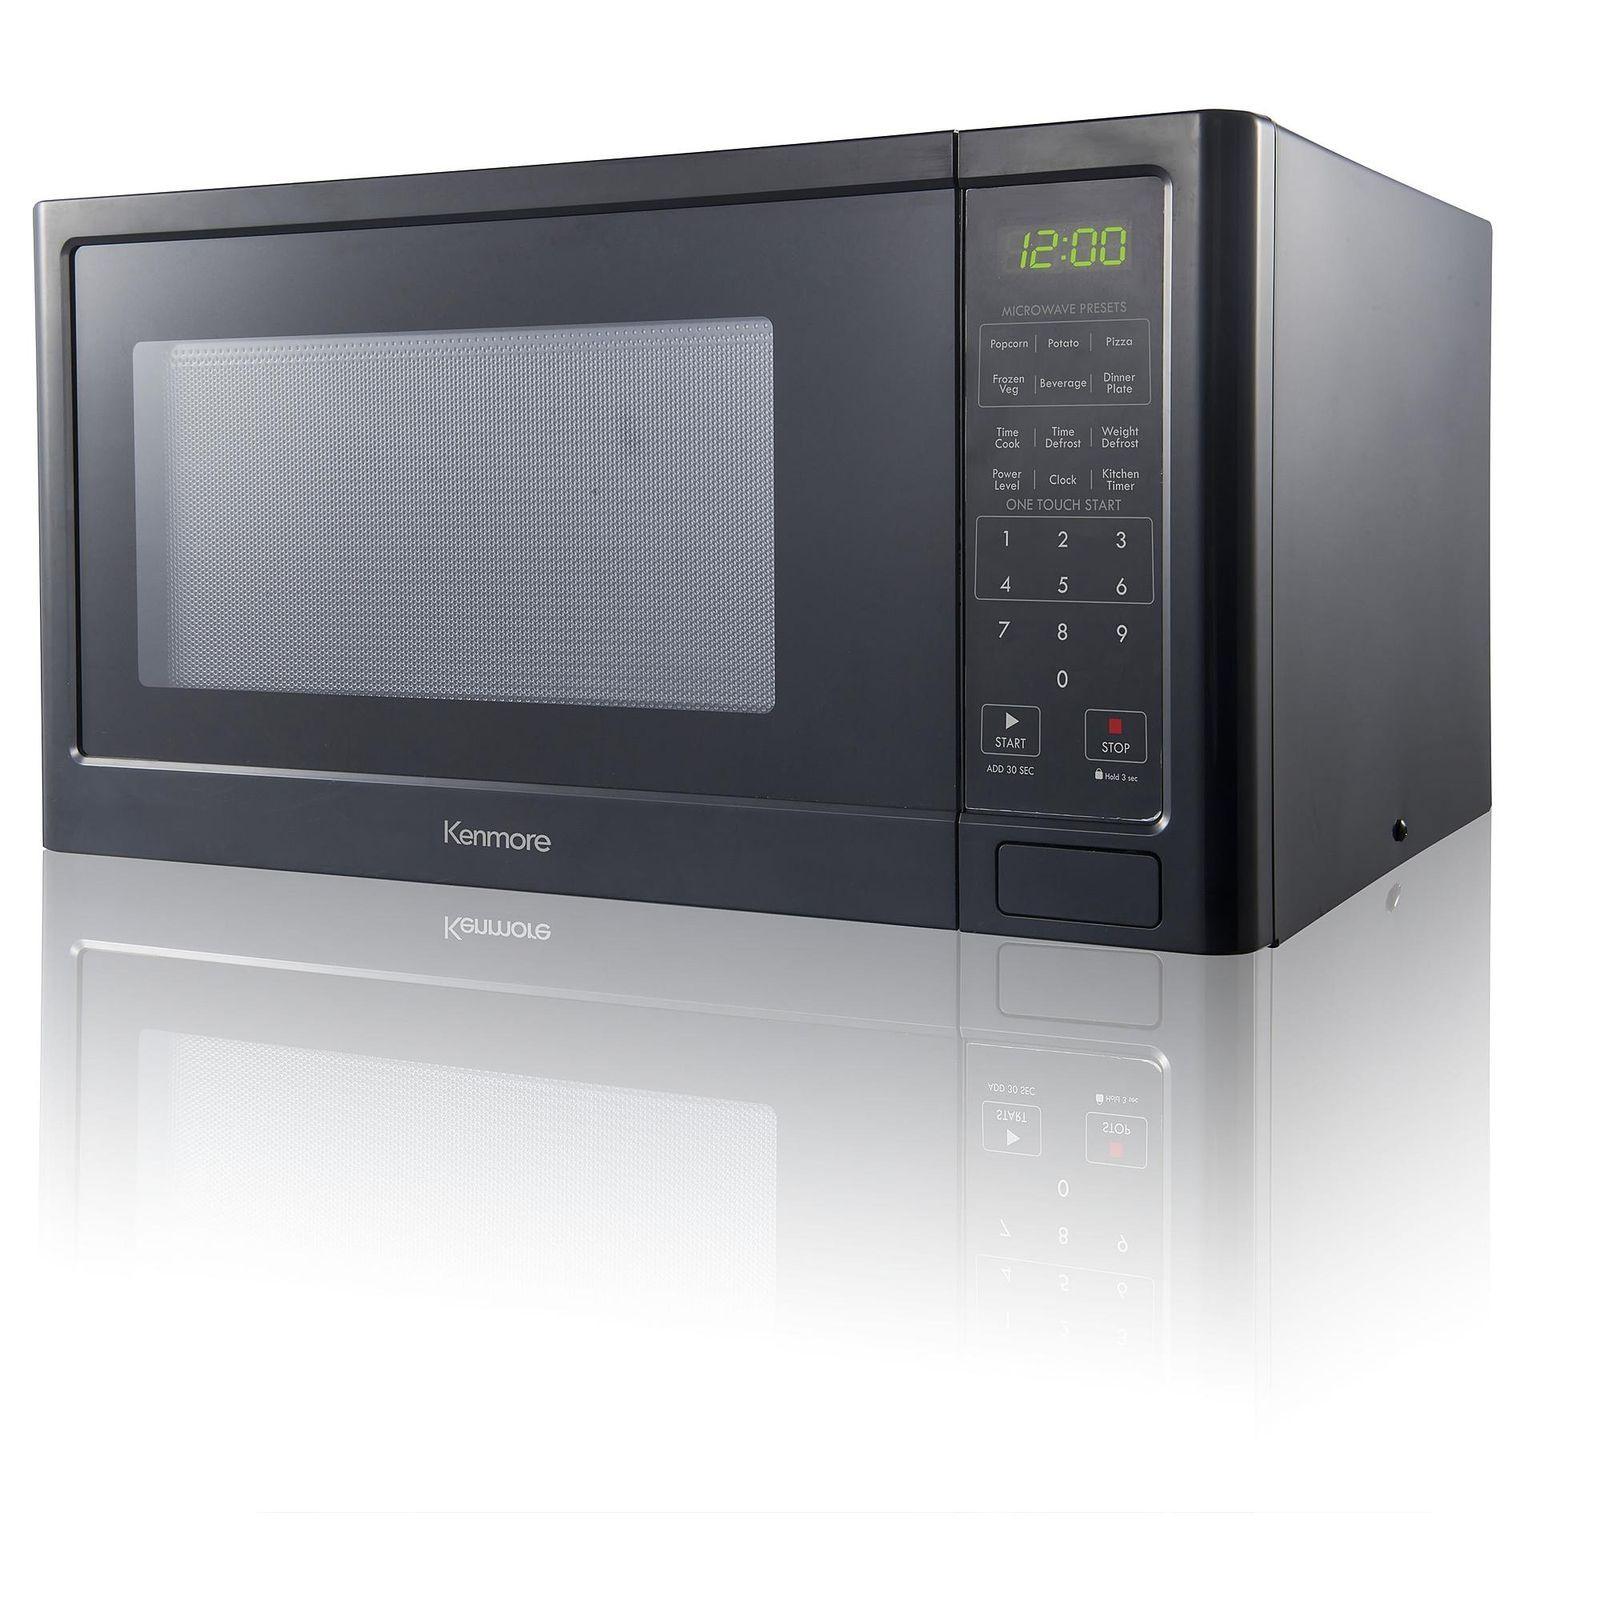 Kenmore Countertop Microwave Oven Black 73779 9 Cu Ft Free